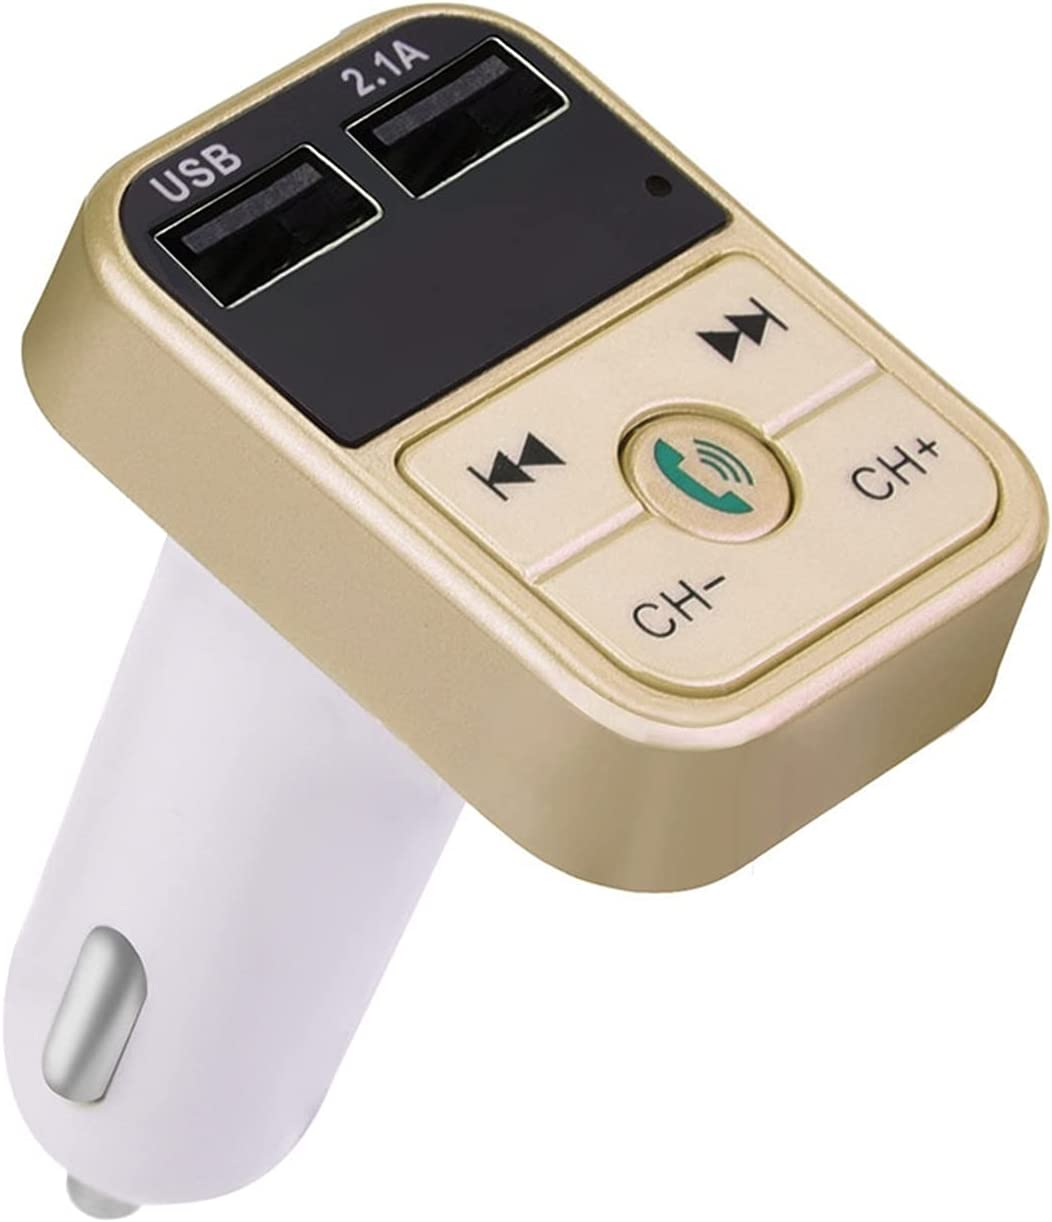 QAZWX Dedication BINZHANG Max 87% OFF FM Transmitters LCD Player USB MP3 Charger Bl